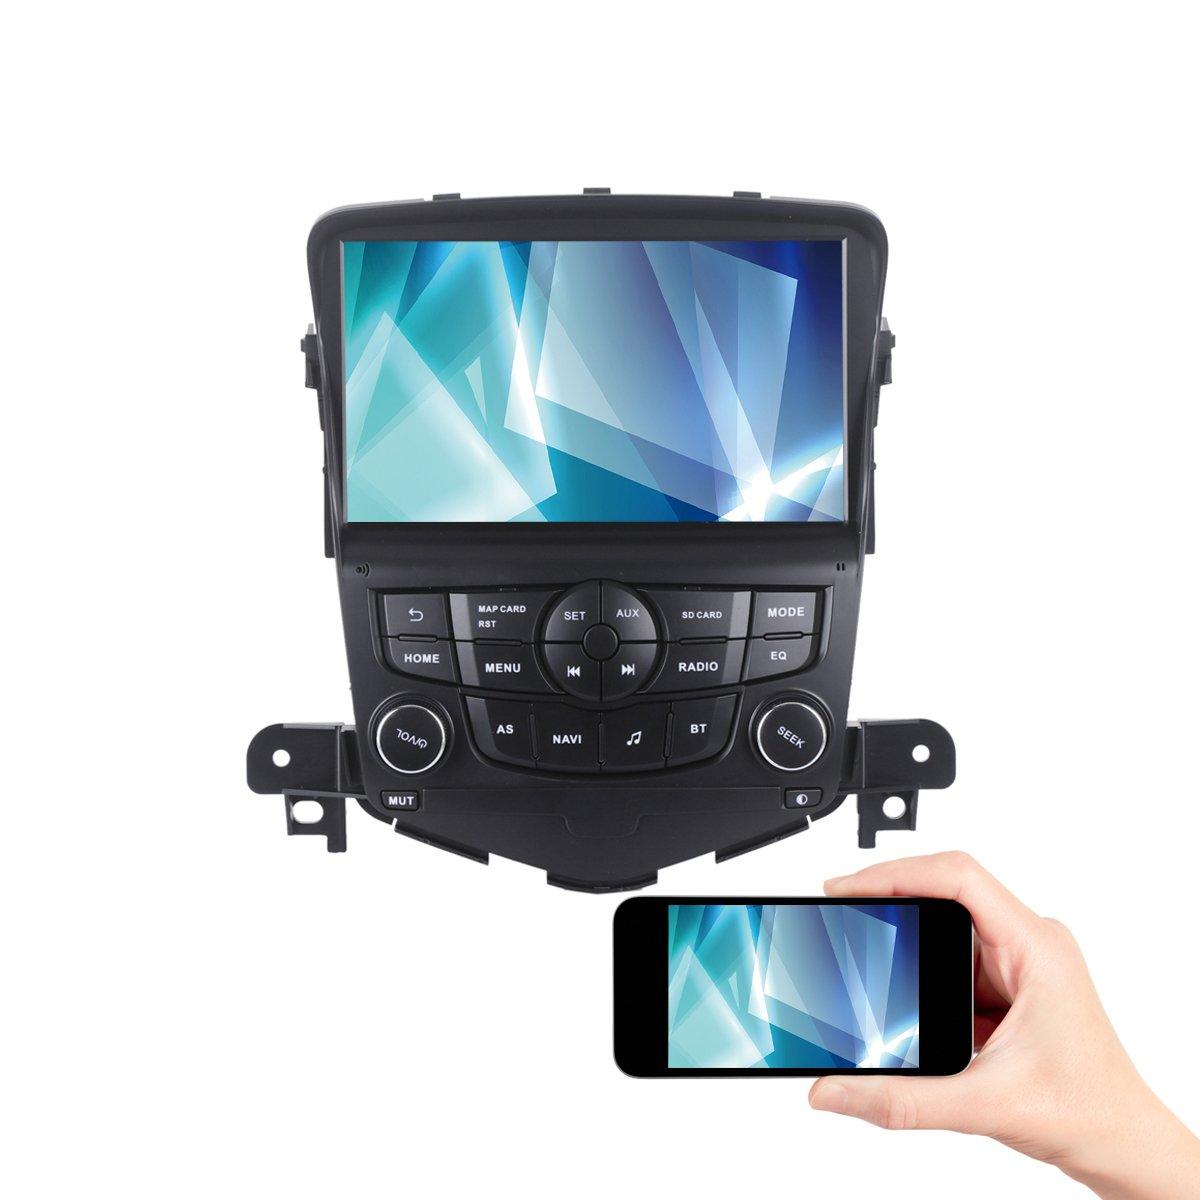 Amazon.com: Dasaita Android 7.1 Car Stereo for Chevrolet Cruze Gps ...